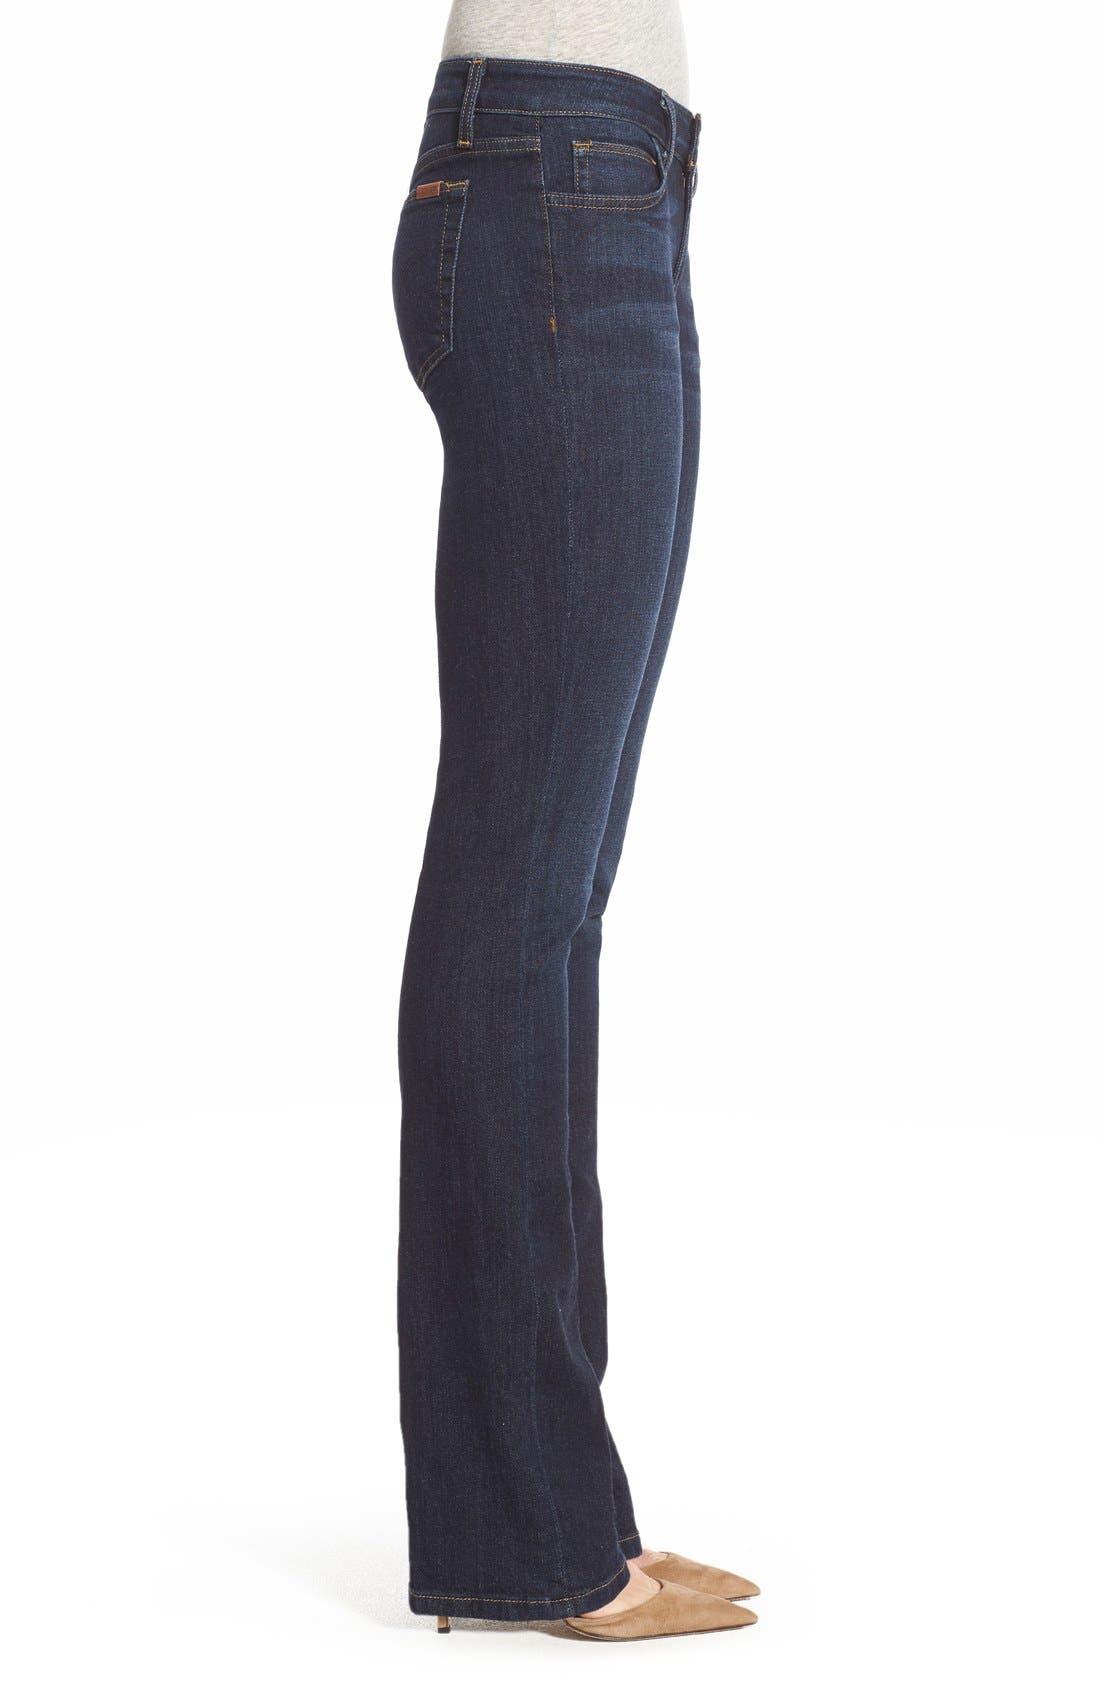 Honey Curvy Bootcut Jeans,                             Alternate thumbnail 3, color,                             Rikki